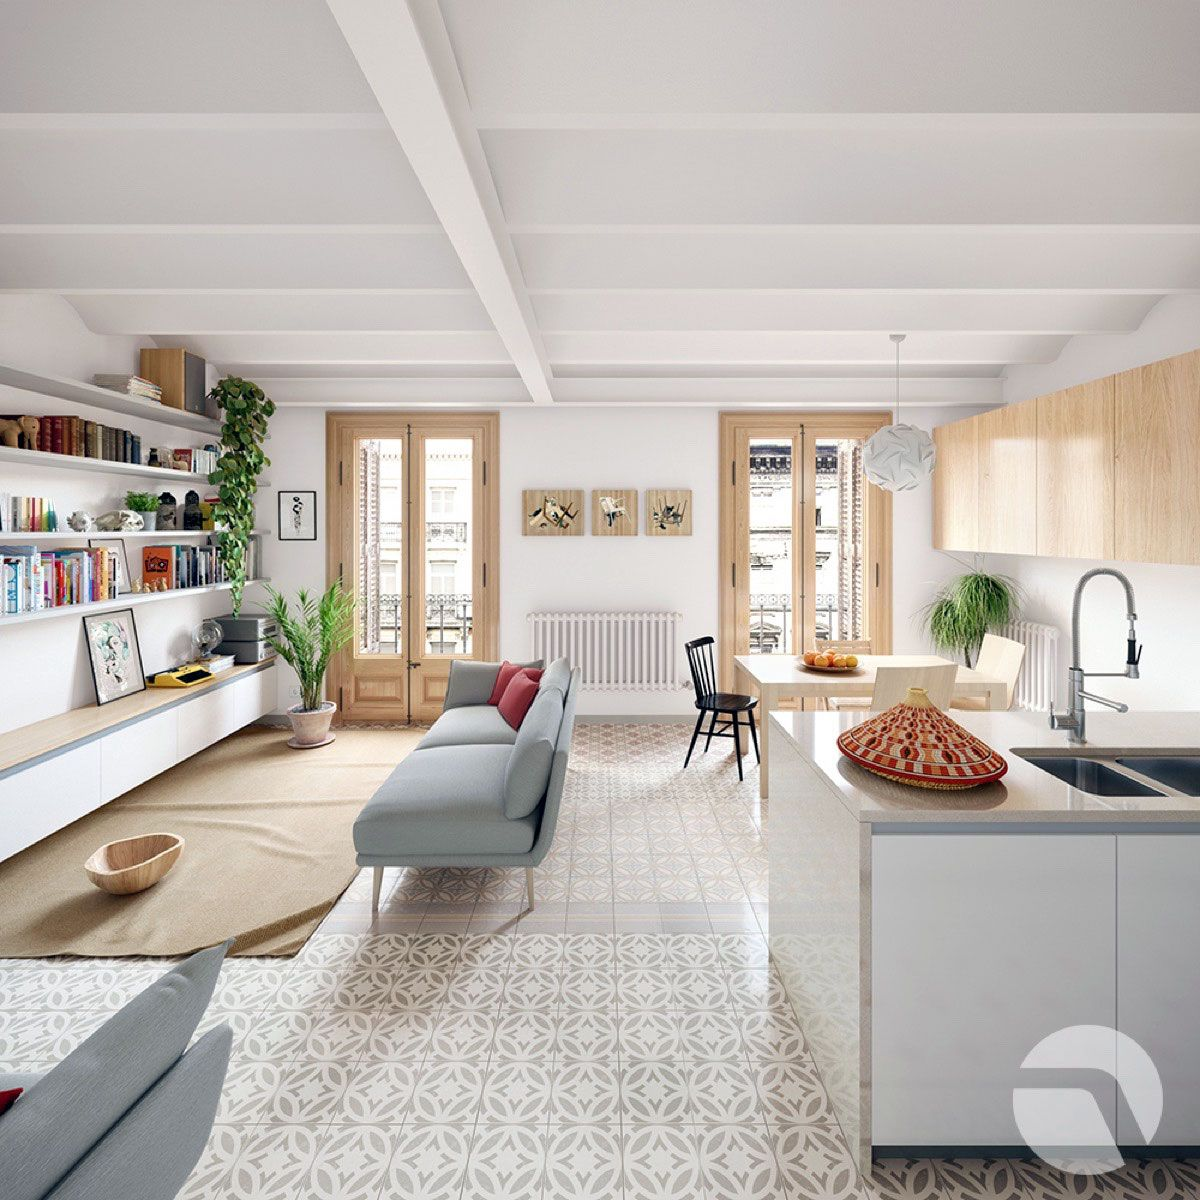 20 Adorable Scandinavian Kitchen Curtains Ideas In 2020 Townhouse Interior Modern Townhouse Interior Interior Design